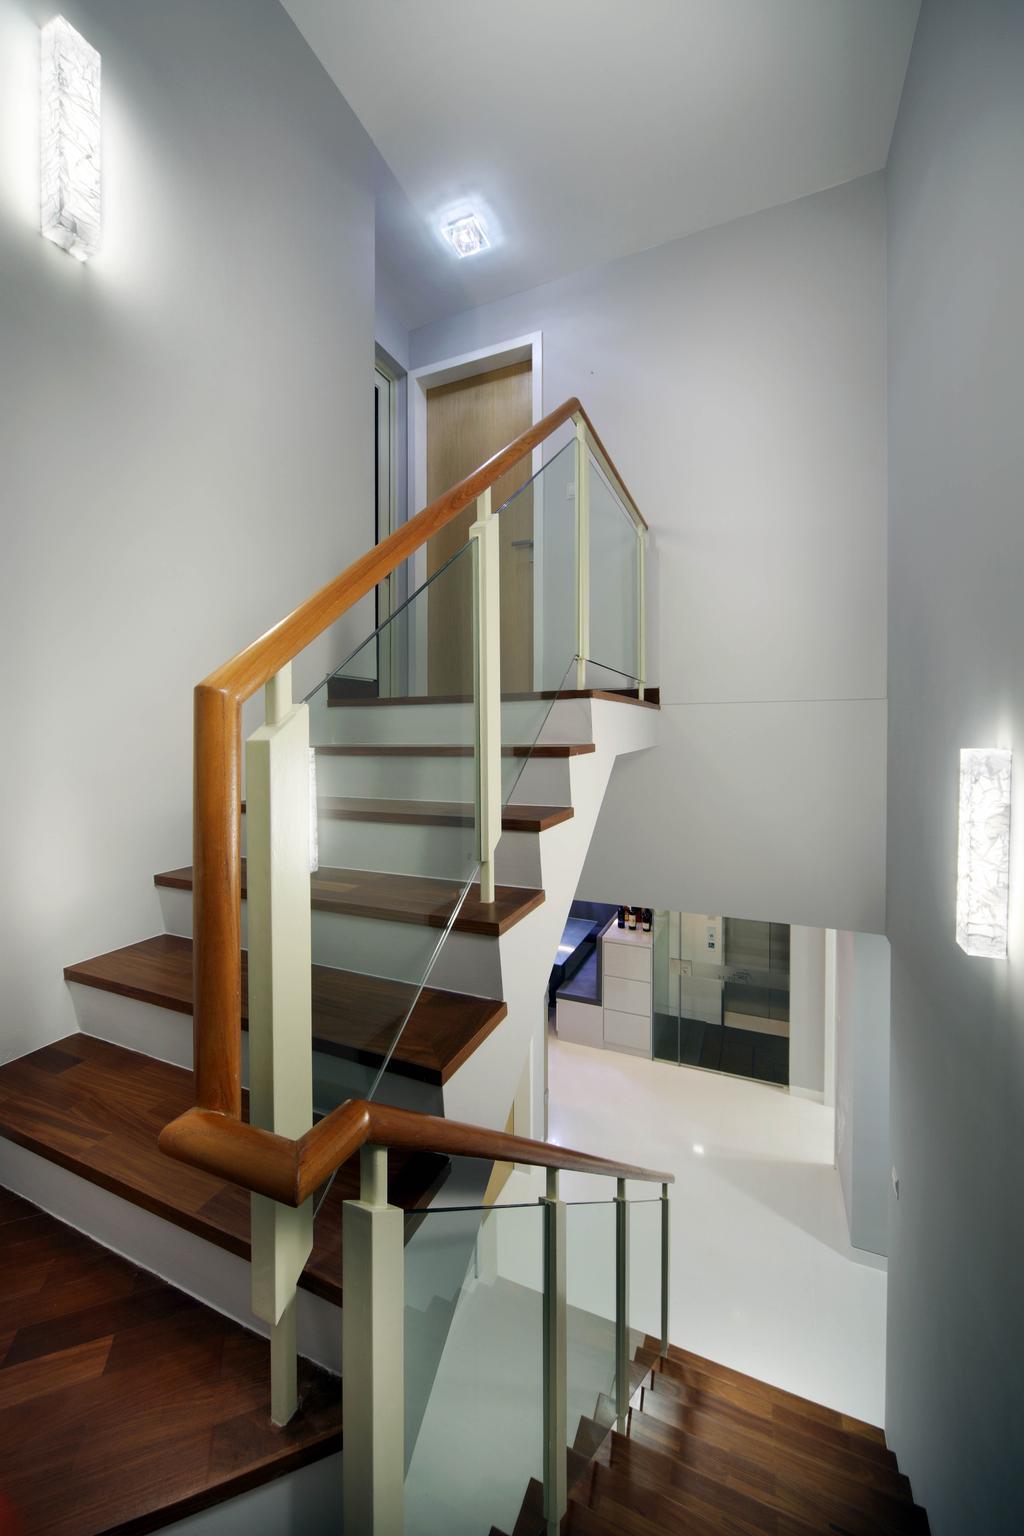 Traditional, Condo, Fontaine Parry, Interior Designer, De Exclusive Design Group, Staircase, Stairs, Banister, Handrail, Shelf, Door, Sliding Door